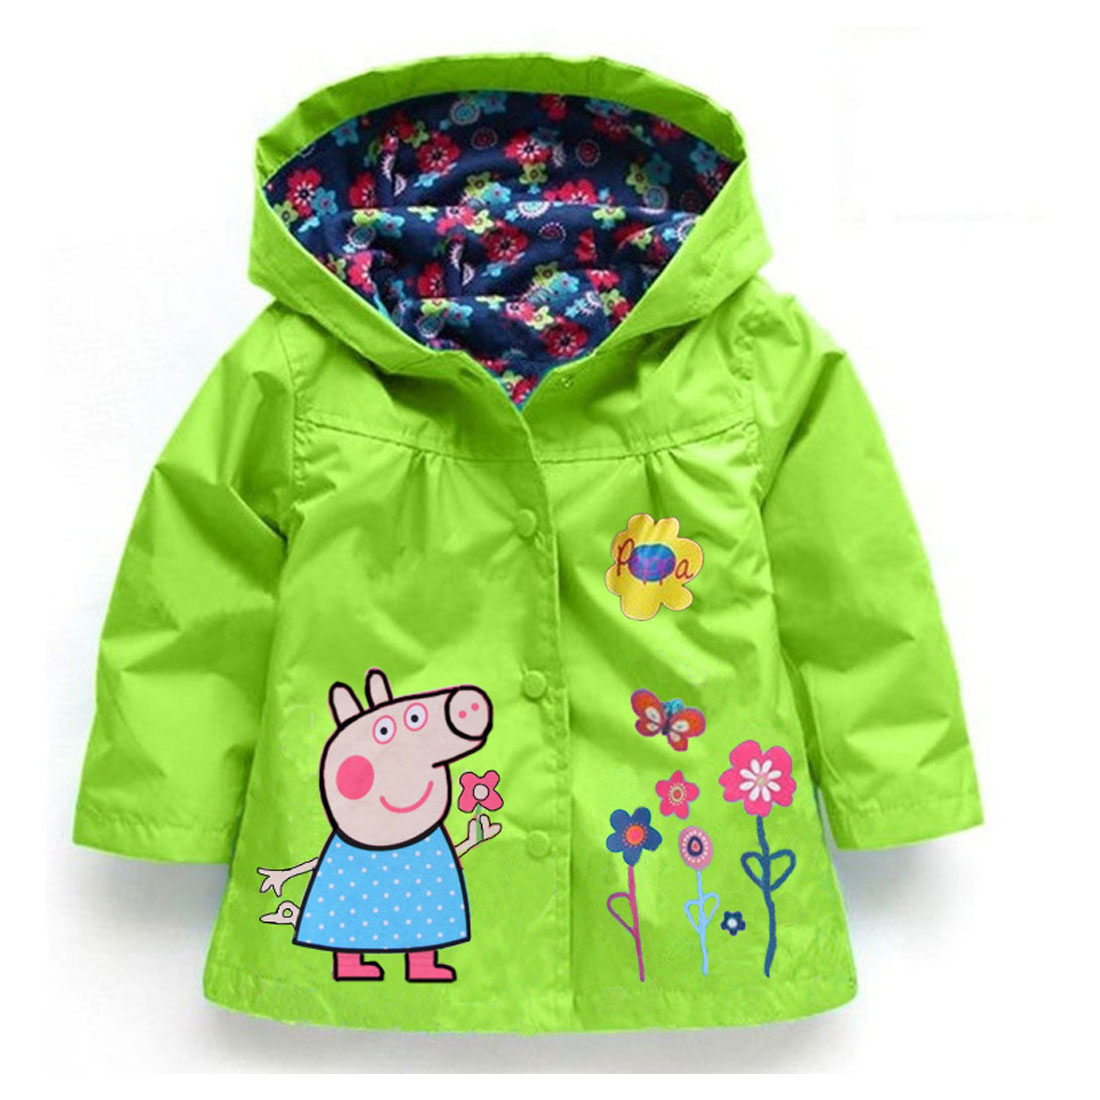 Online Get Cheap Rain Jacket Boys -Aliexpress.com | Alibaba Group